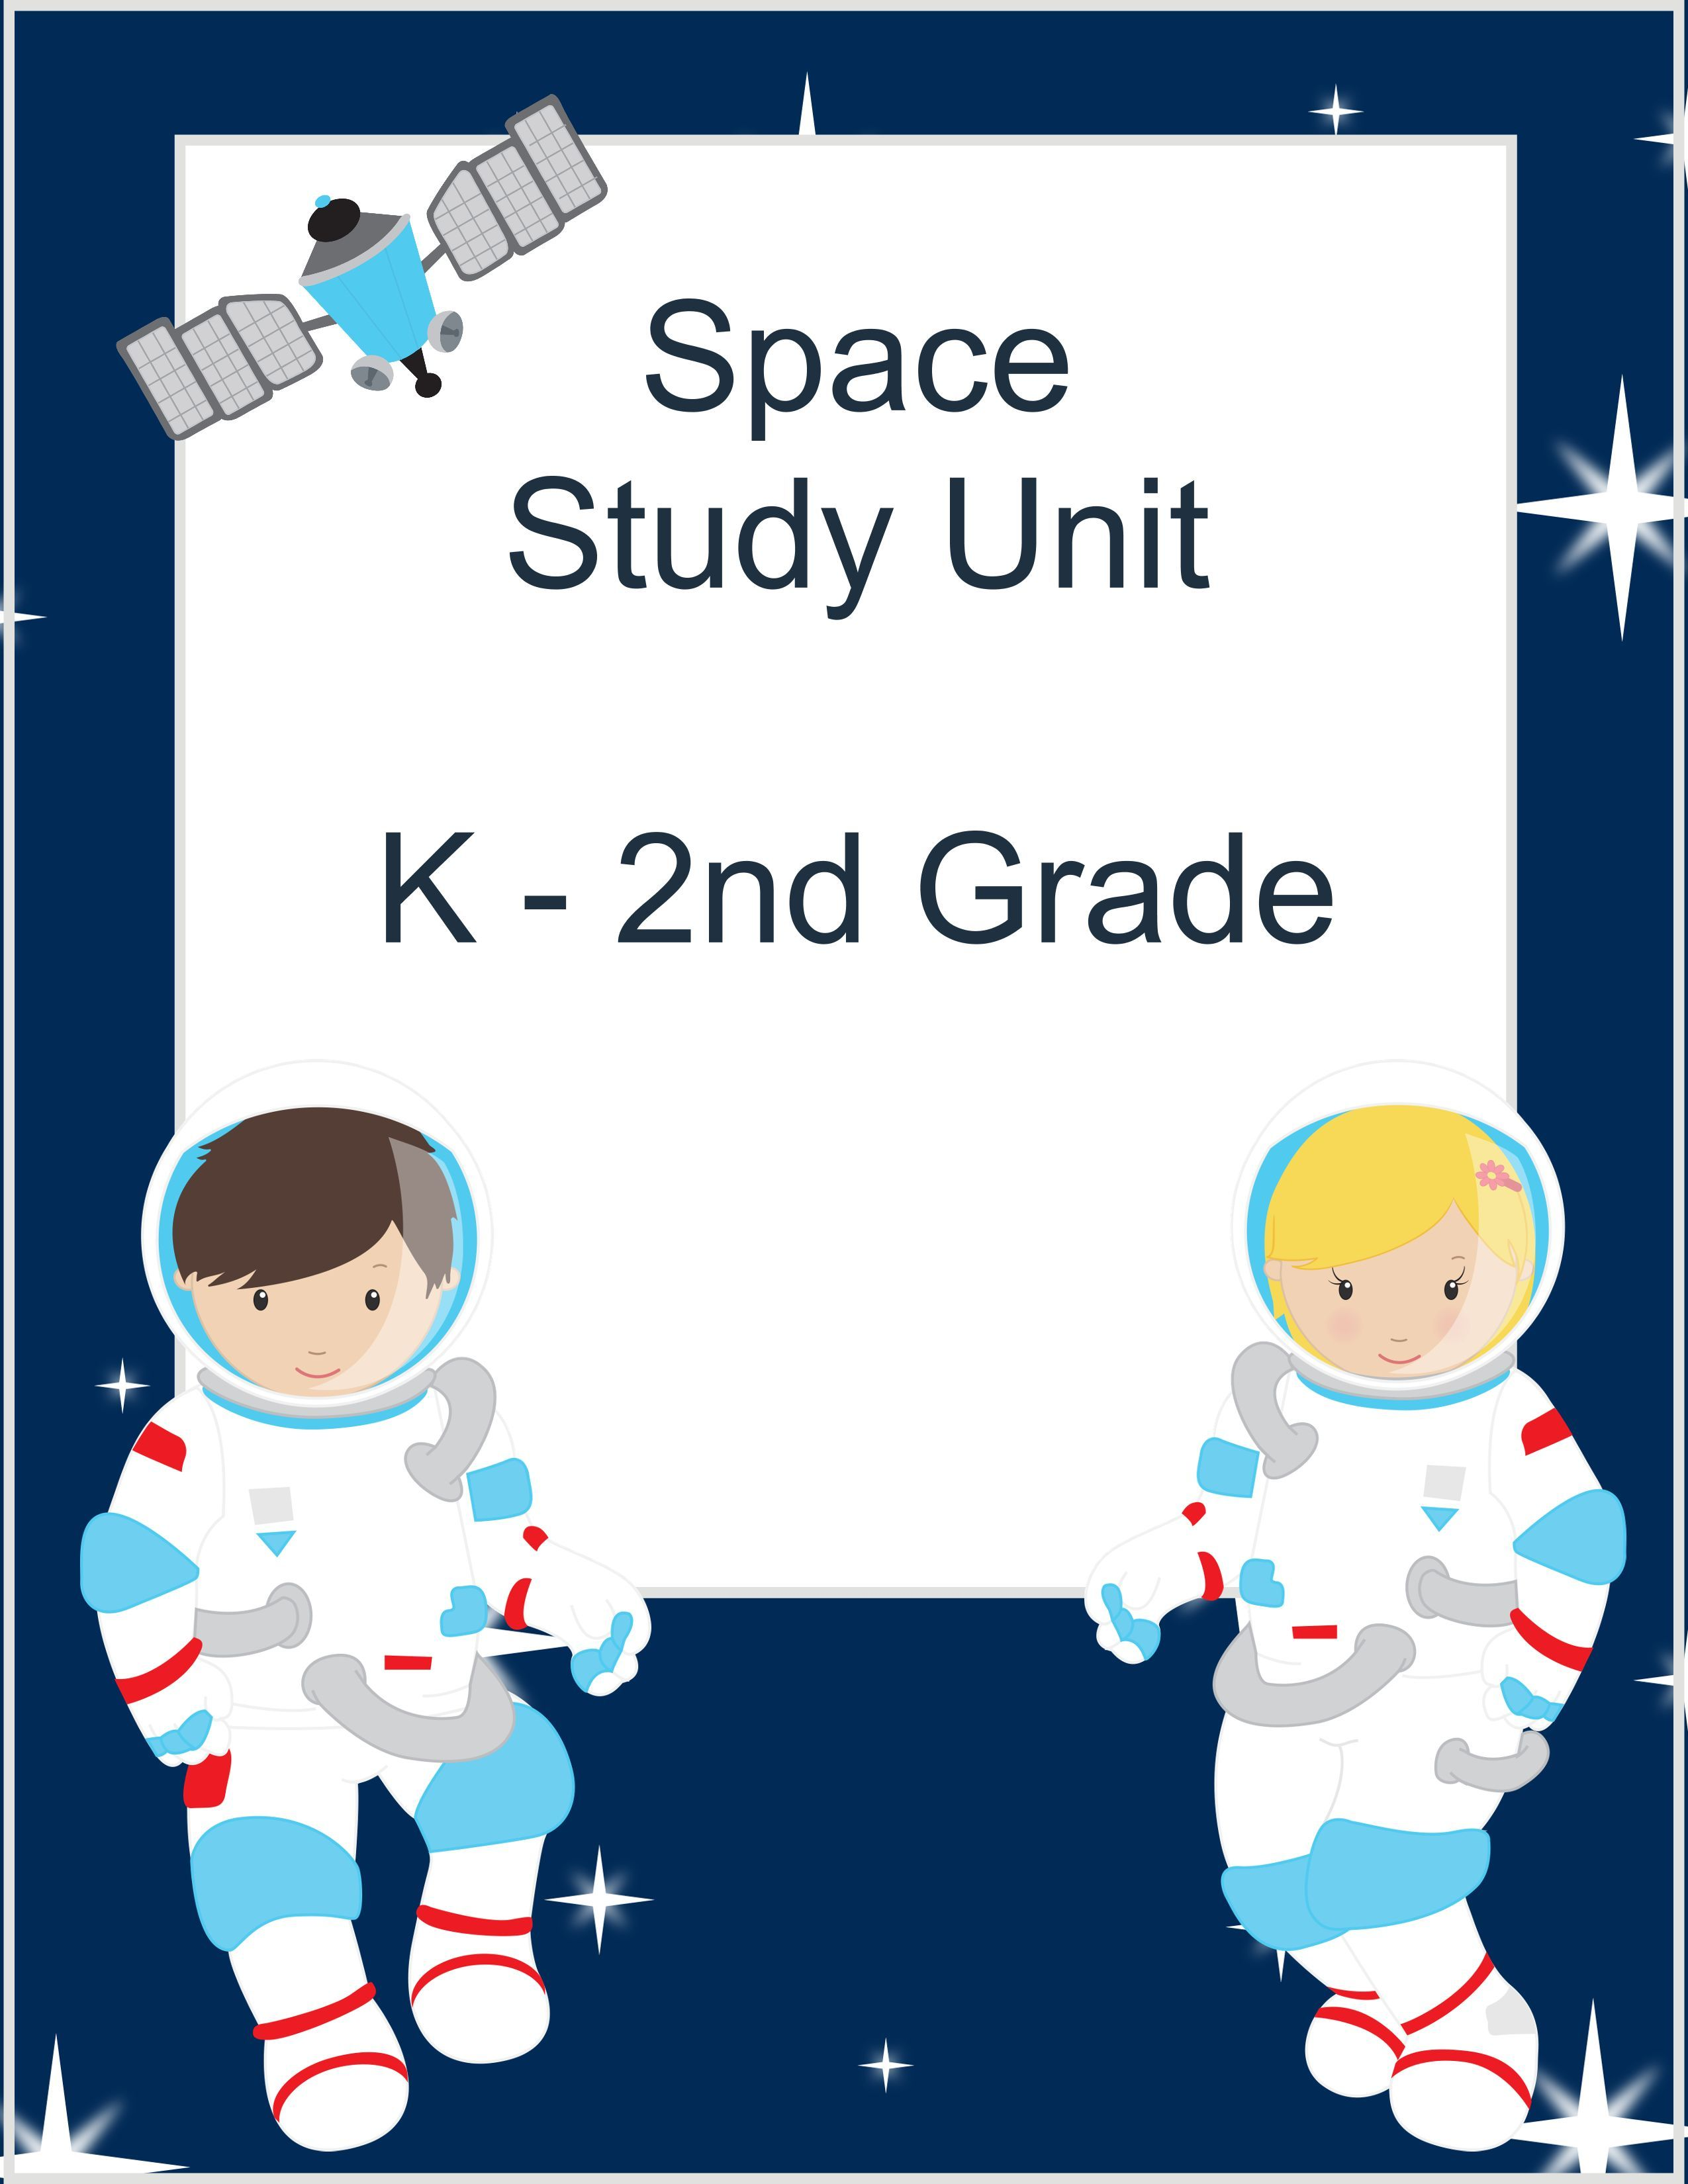 medium resolution of Space Study Unit Ideas - The Relaxed Homeschool   Kindergarten units